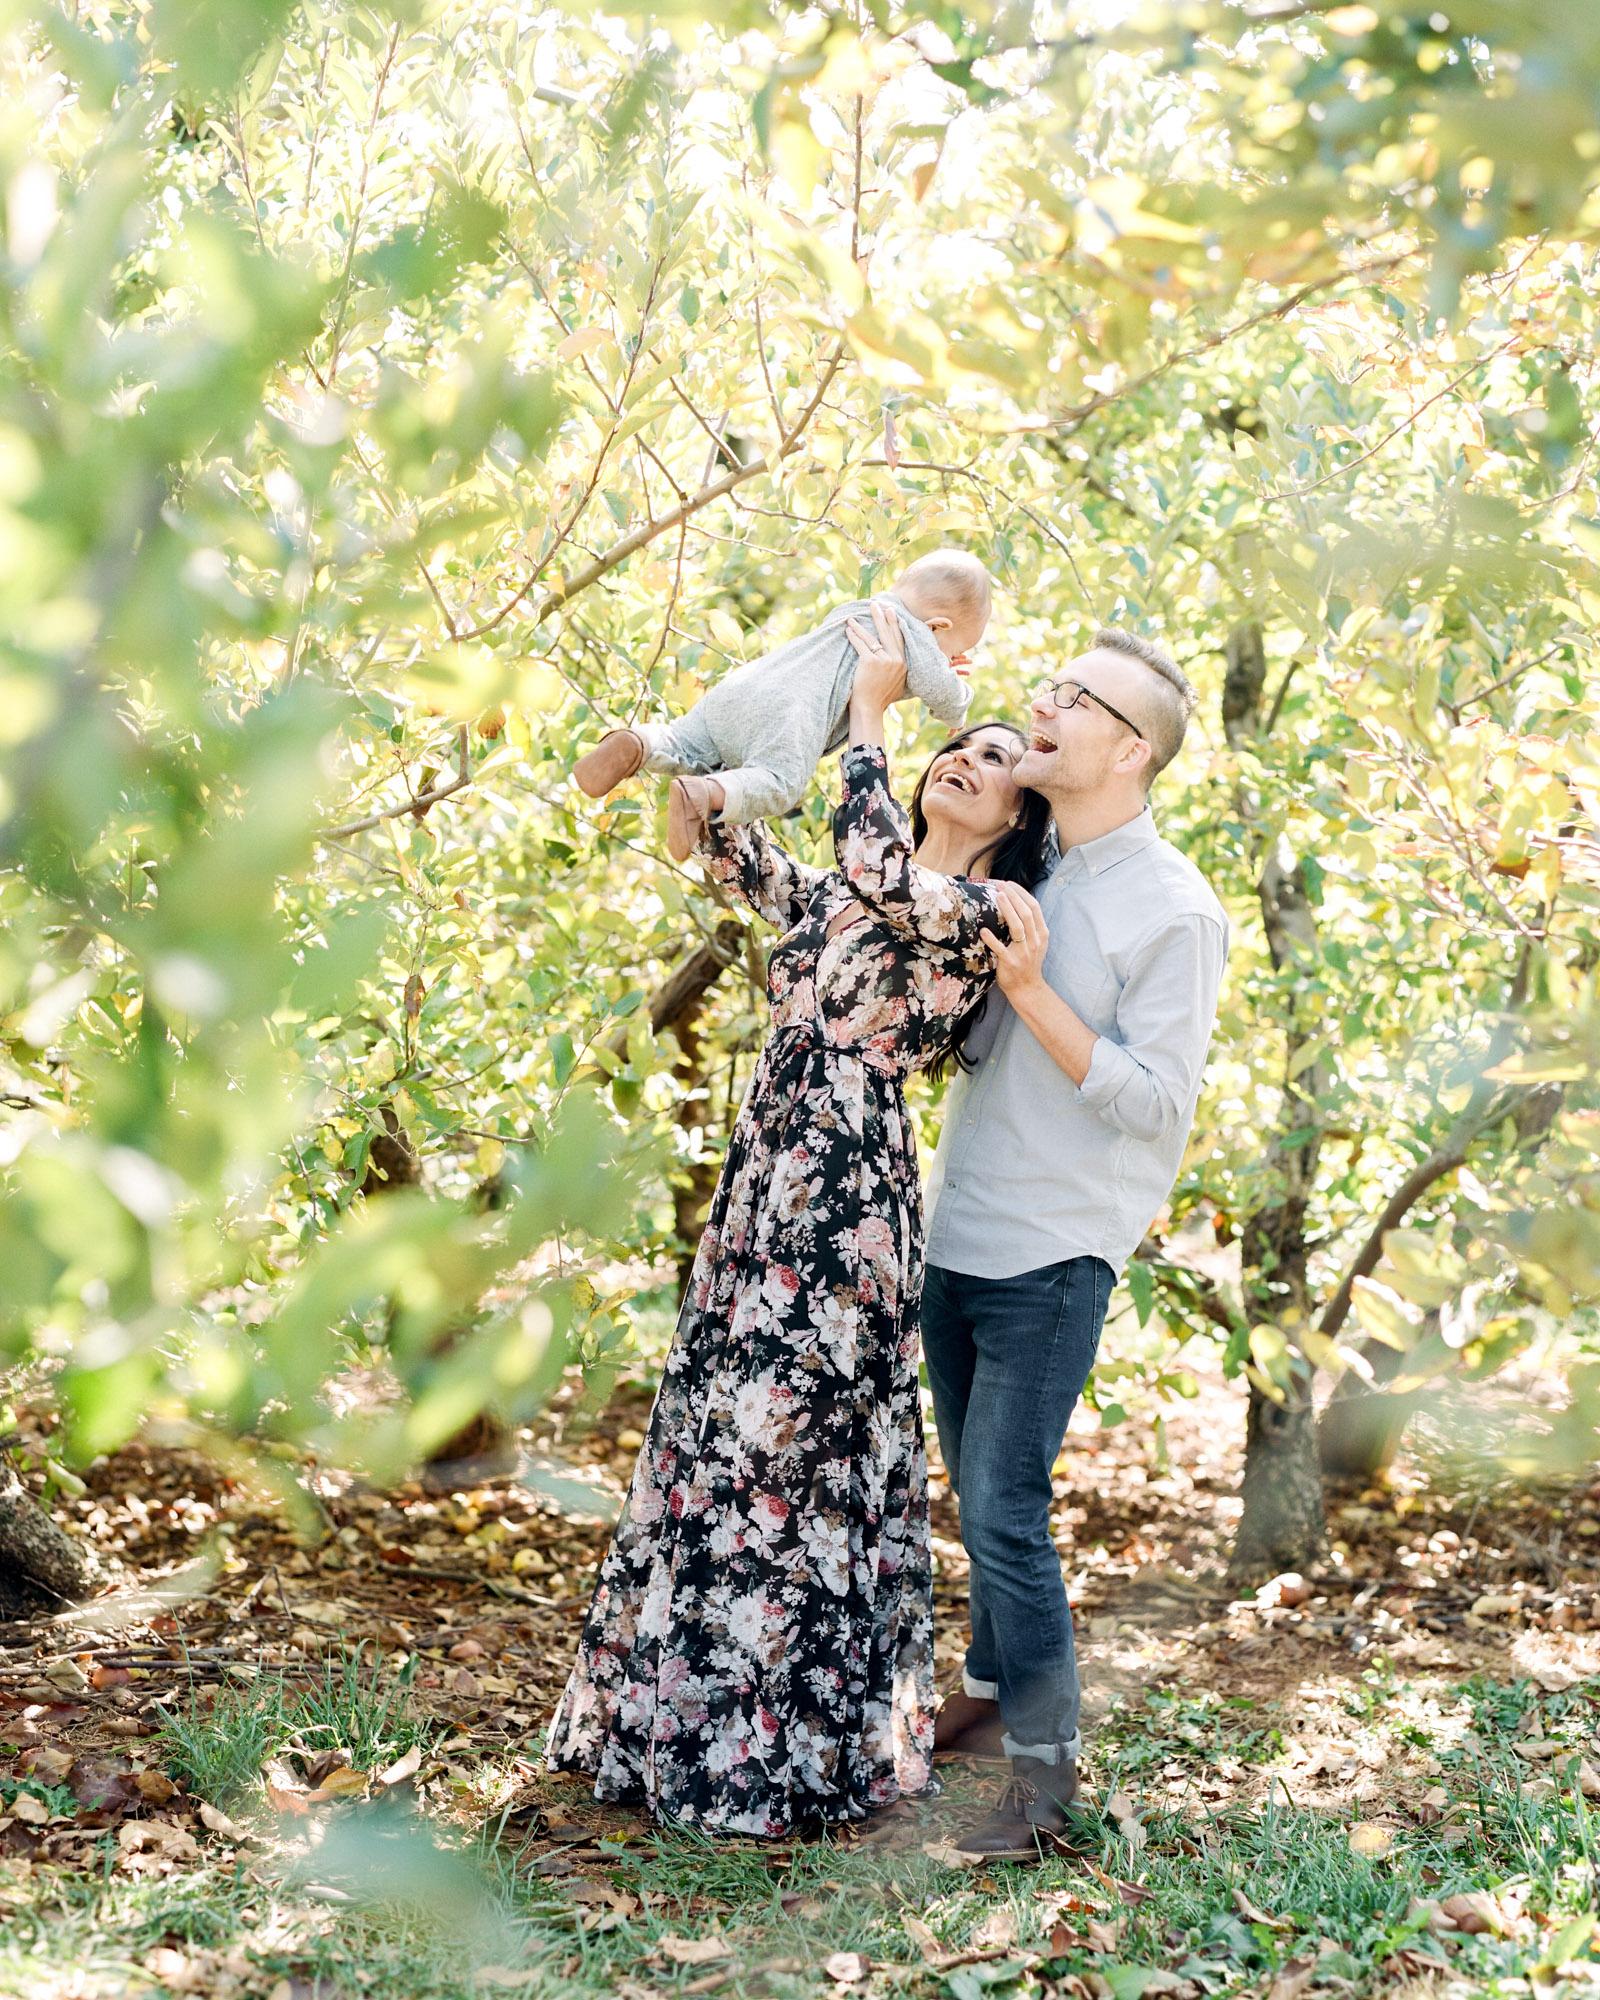 Charlottesville_Charlotte_North_Carolina_Richmond_Virginia_Family_Wedding_Film_Photographer-14.jpg